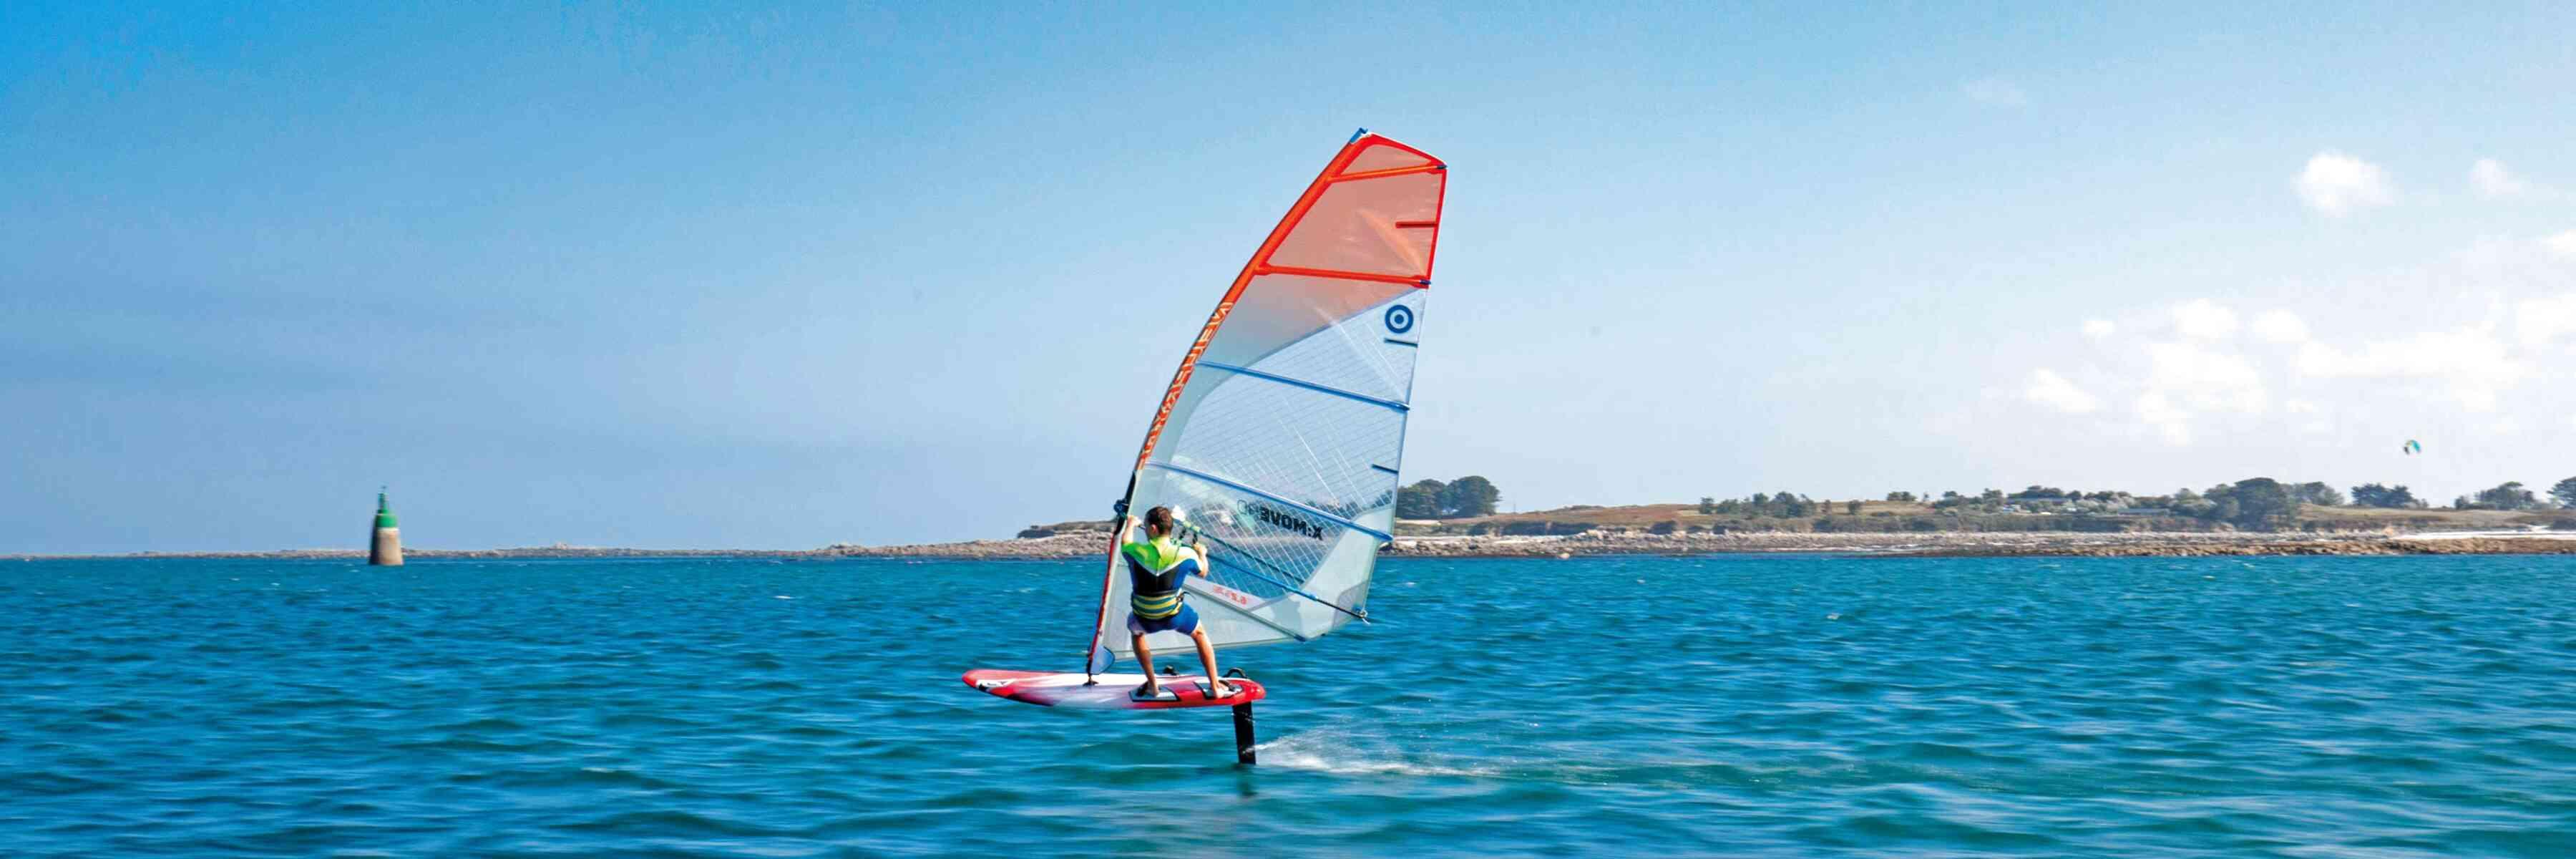 bic windsurf for sale